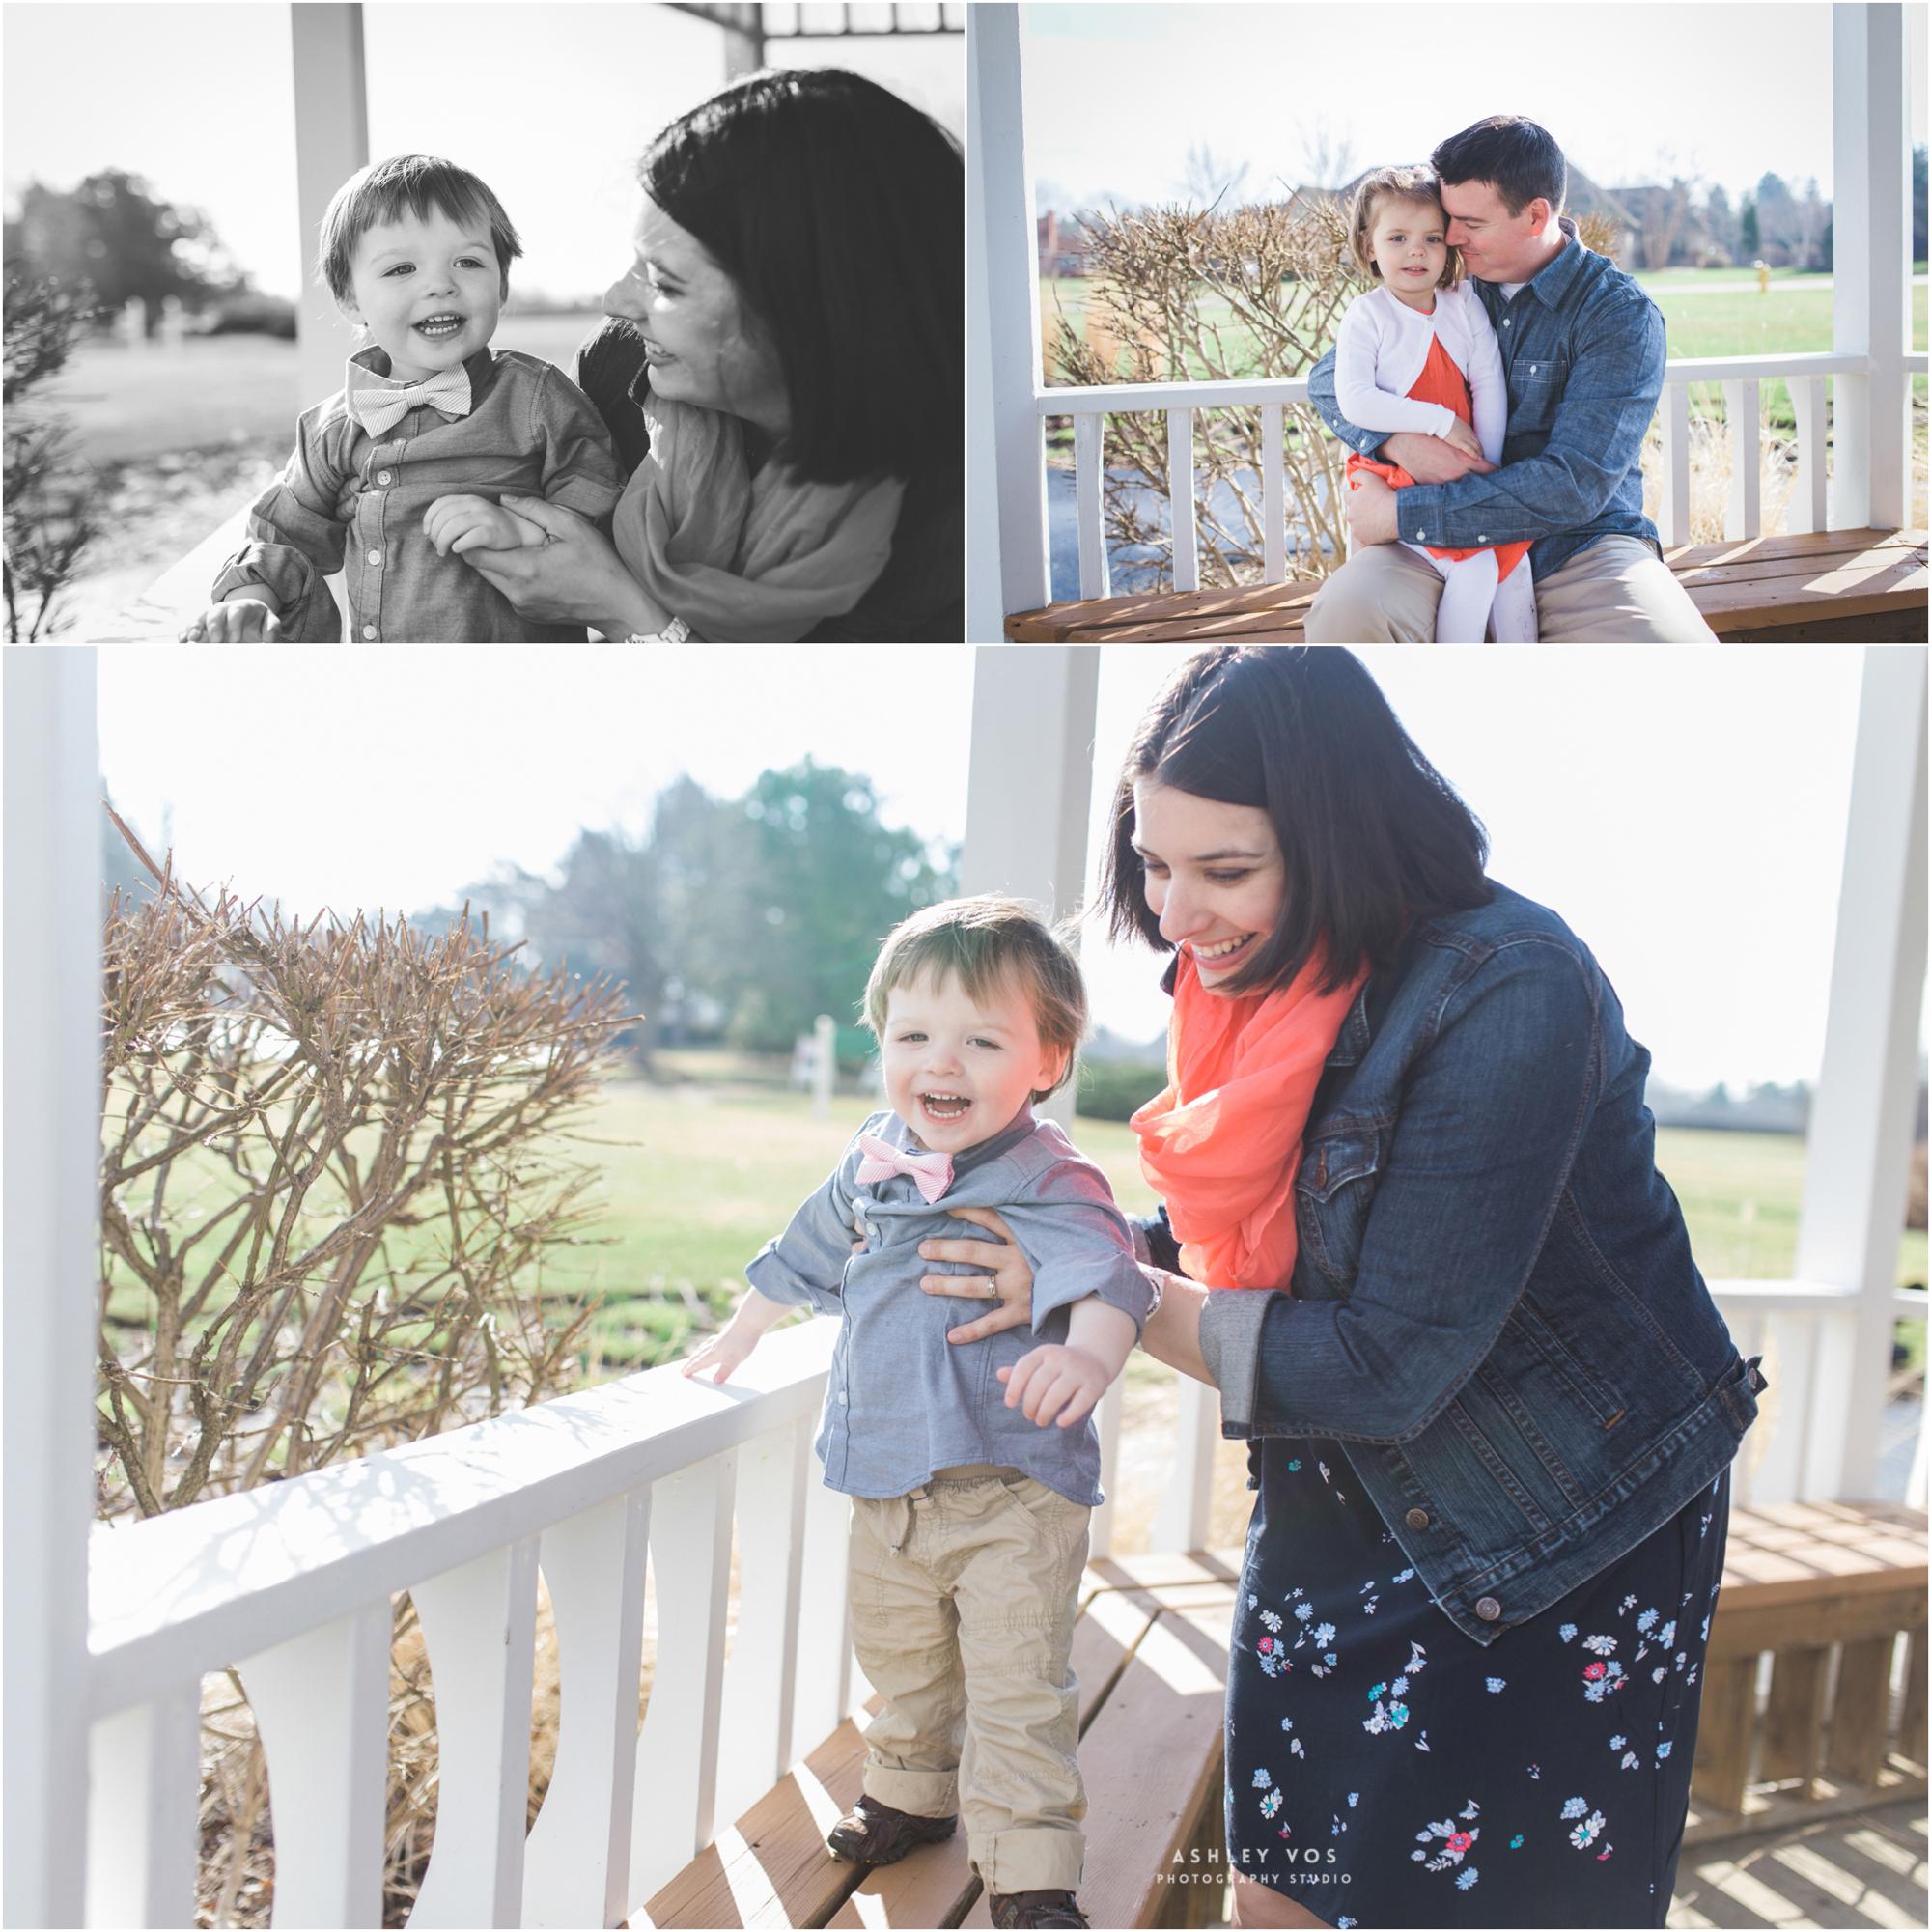 Ashley Vos Photography Seattle Lifestyle Family Photography_0032.jpg